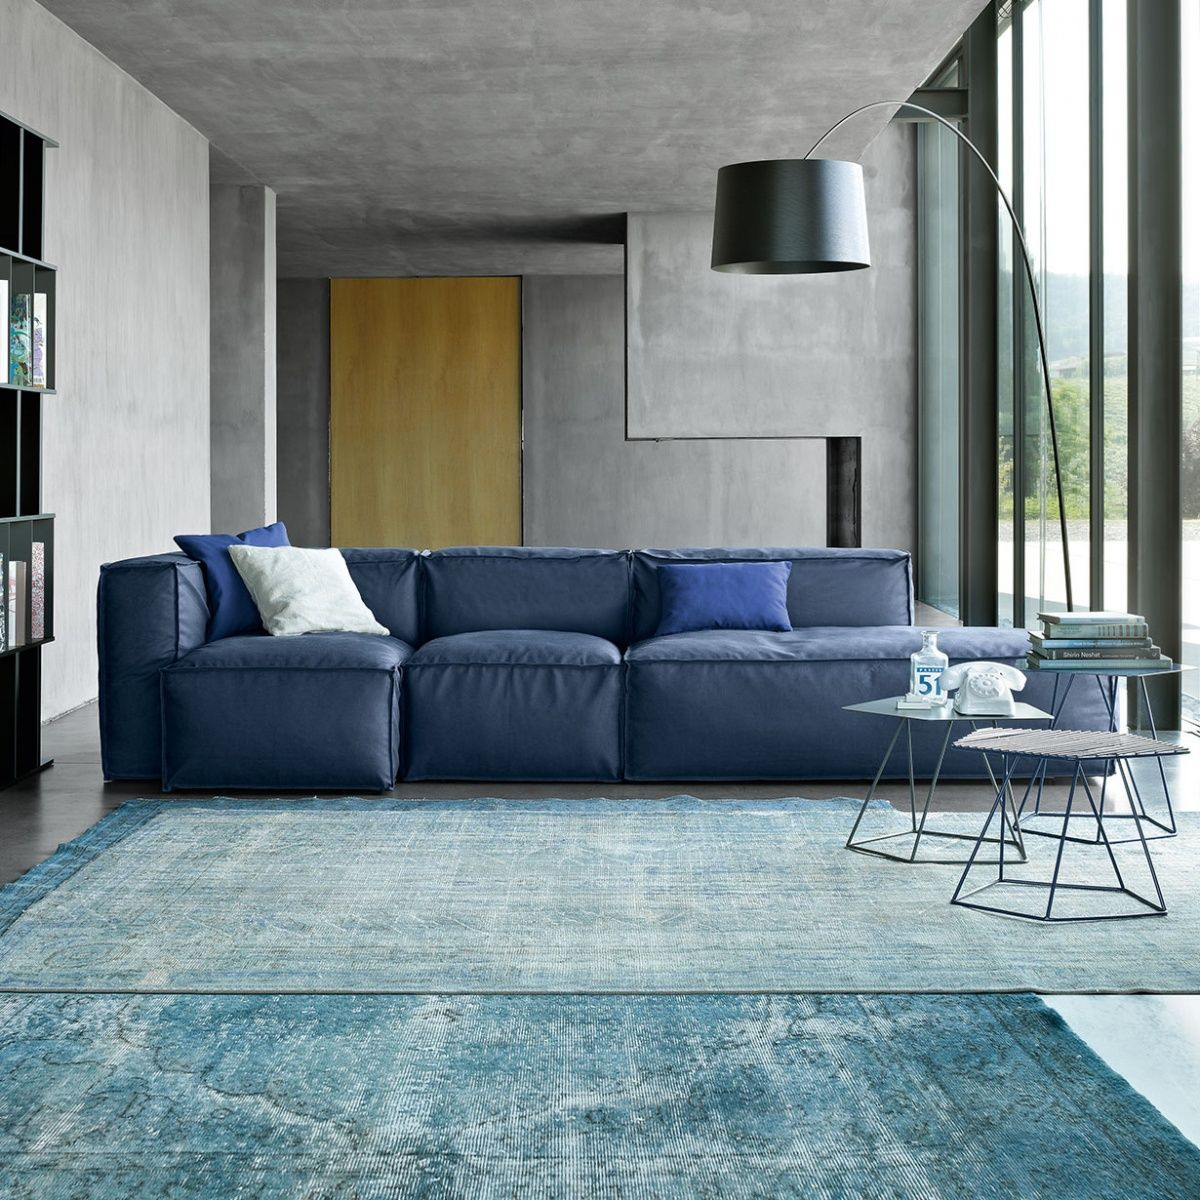 Peanut B design modular sofa characterized by